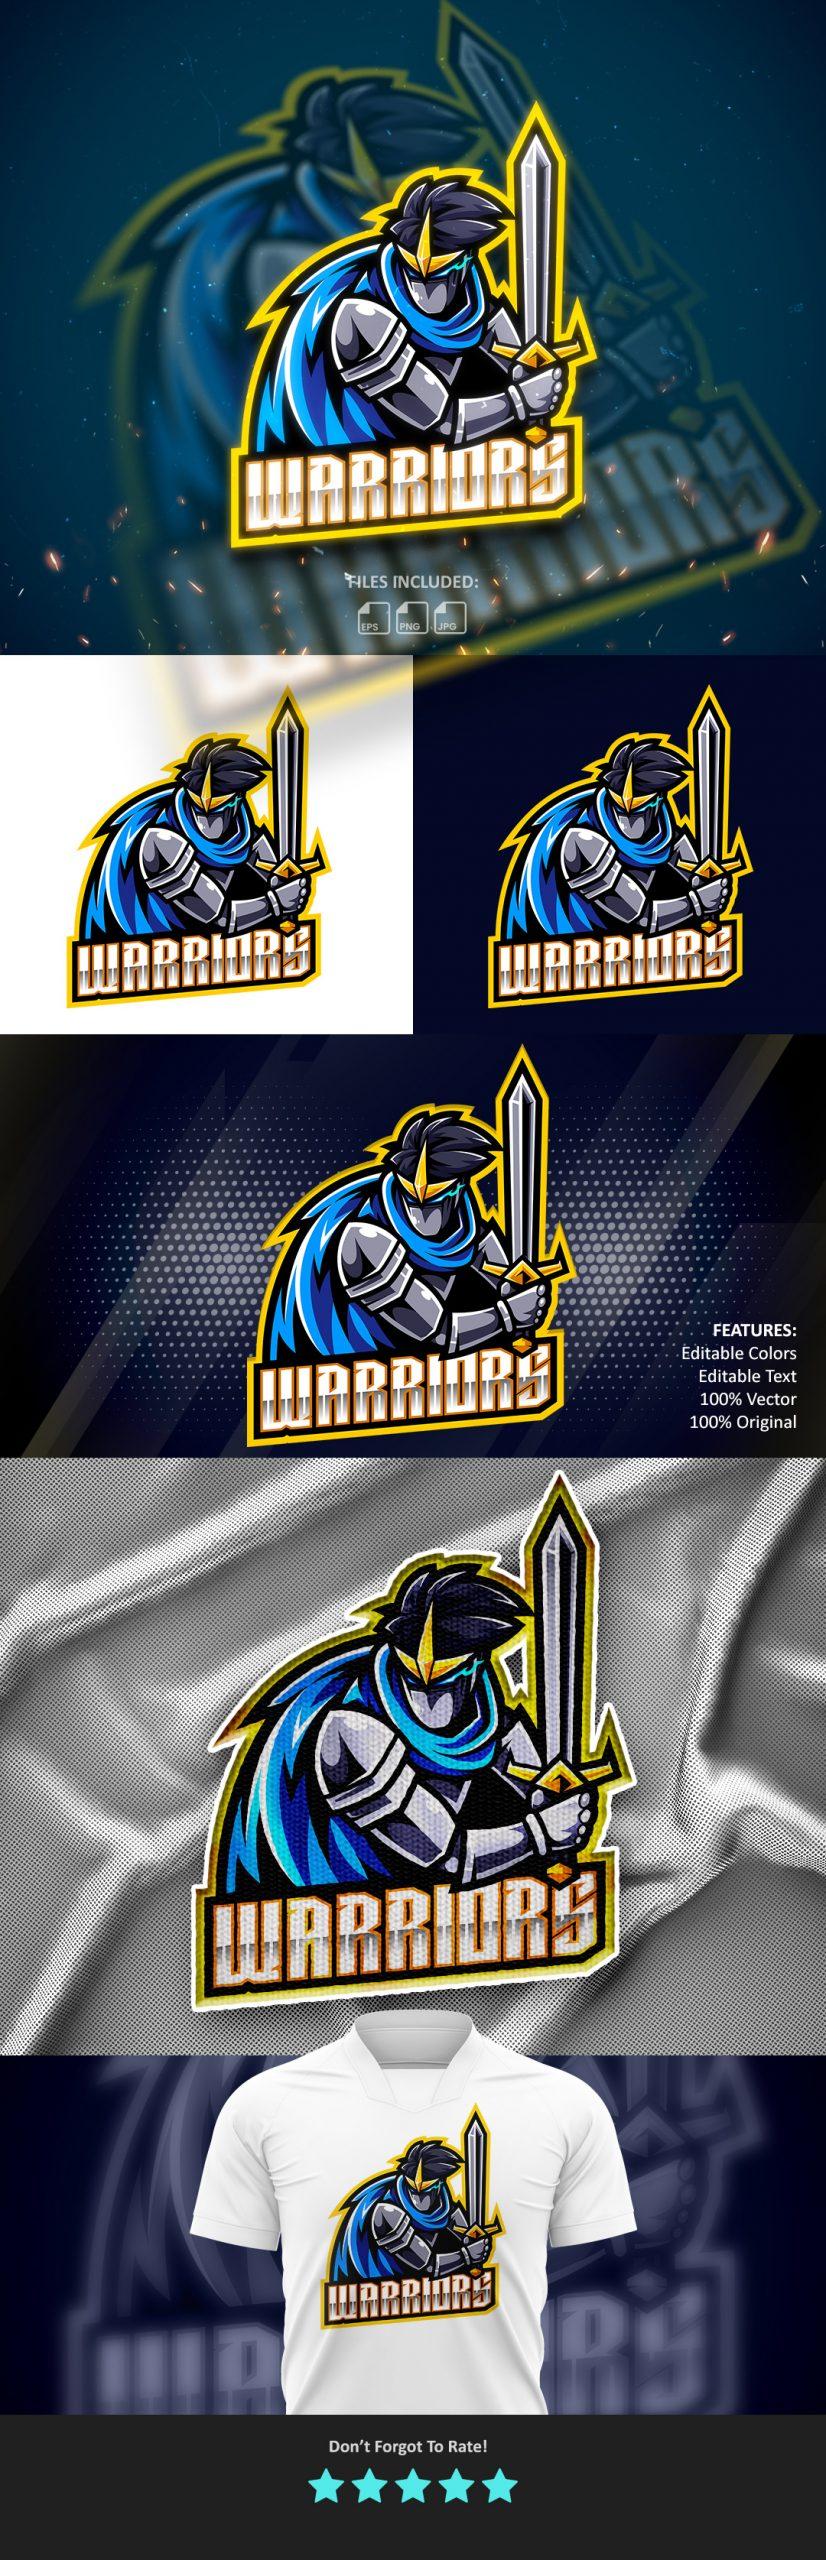 Warriors-Esports-Gaming-Clan-Mascot-Logo-Free-Download